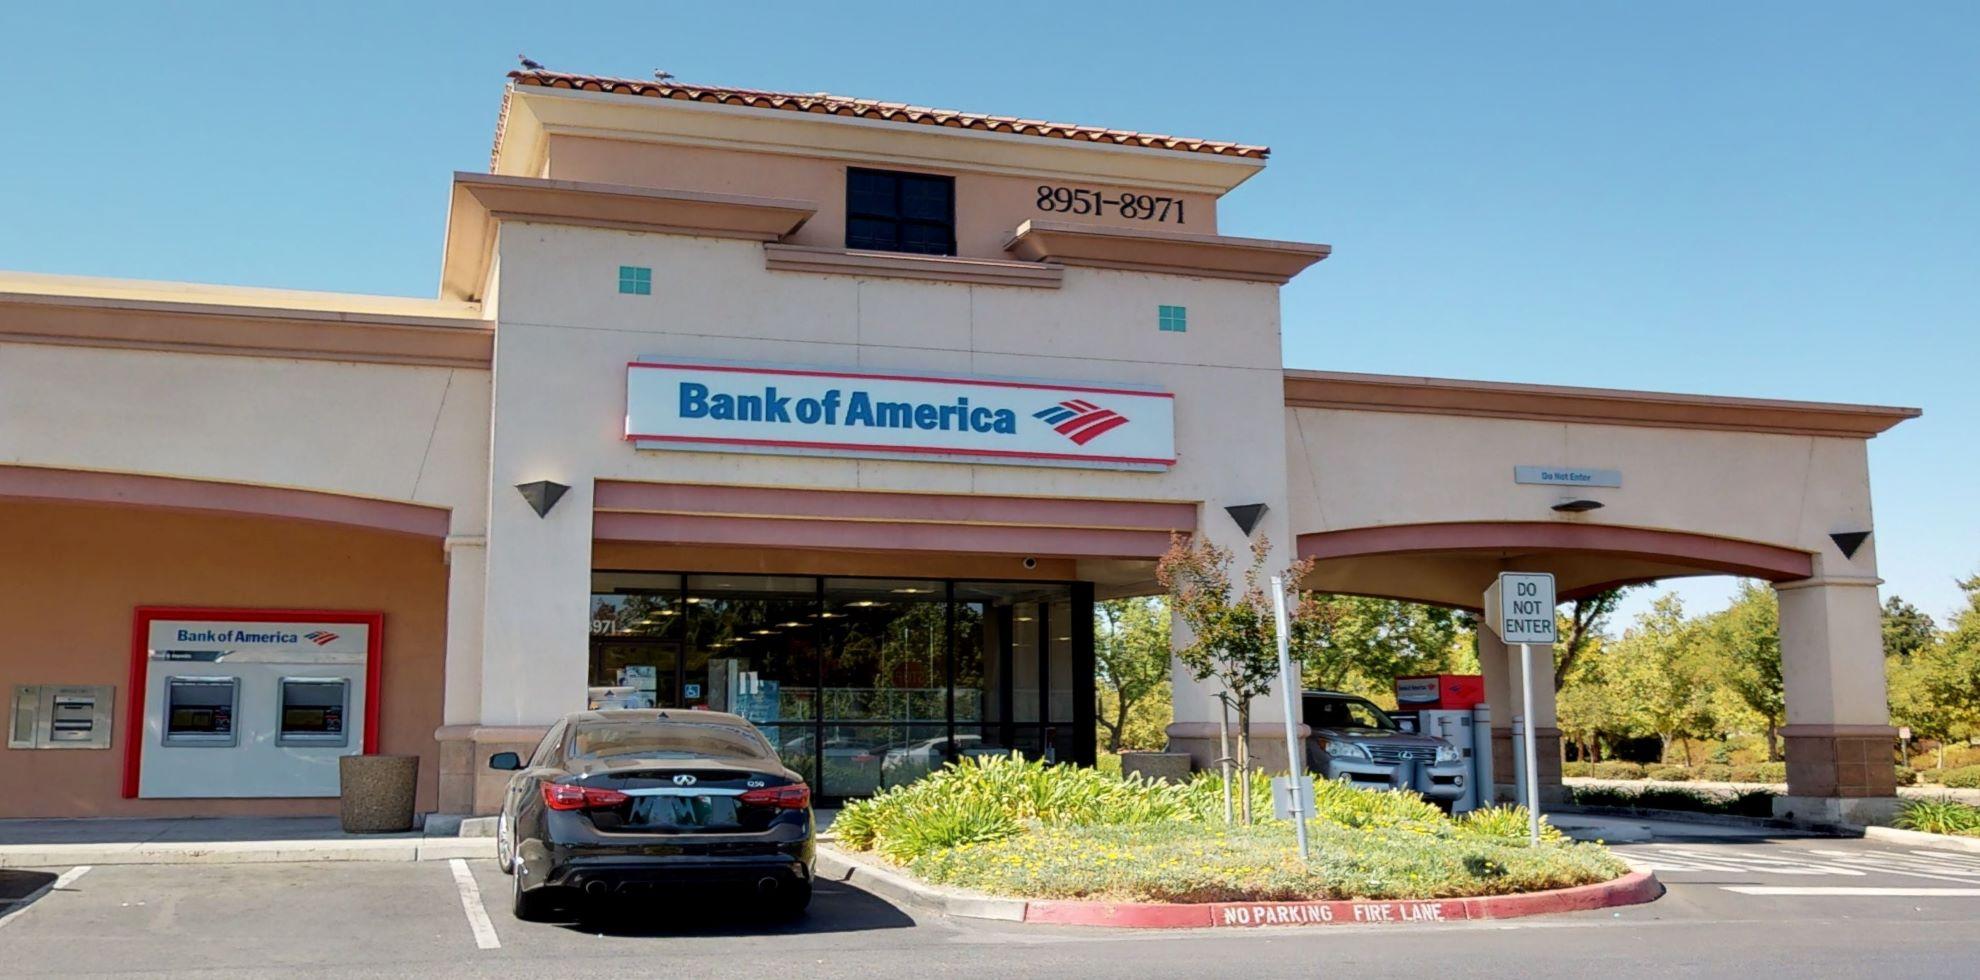 Bank of America financial center with drive-thru ATM   8971 N Cedar Ave, Fresno, CA 93720